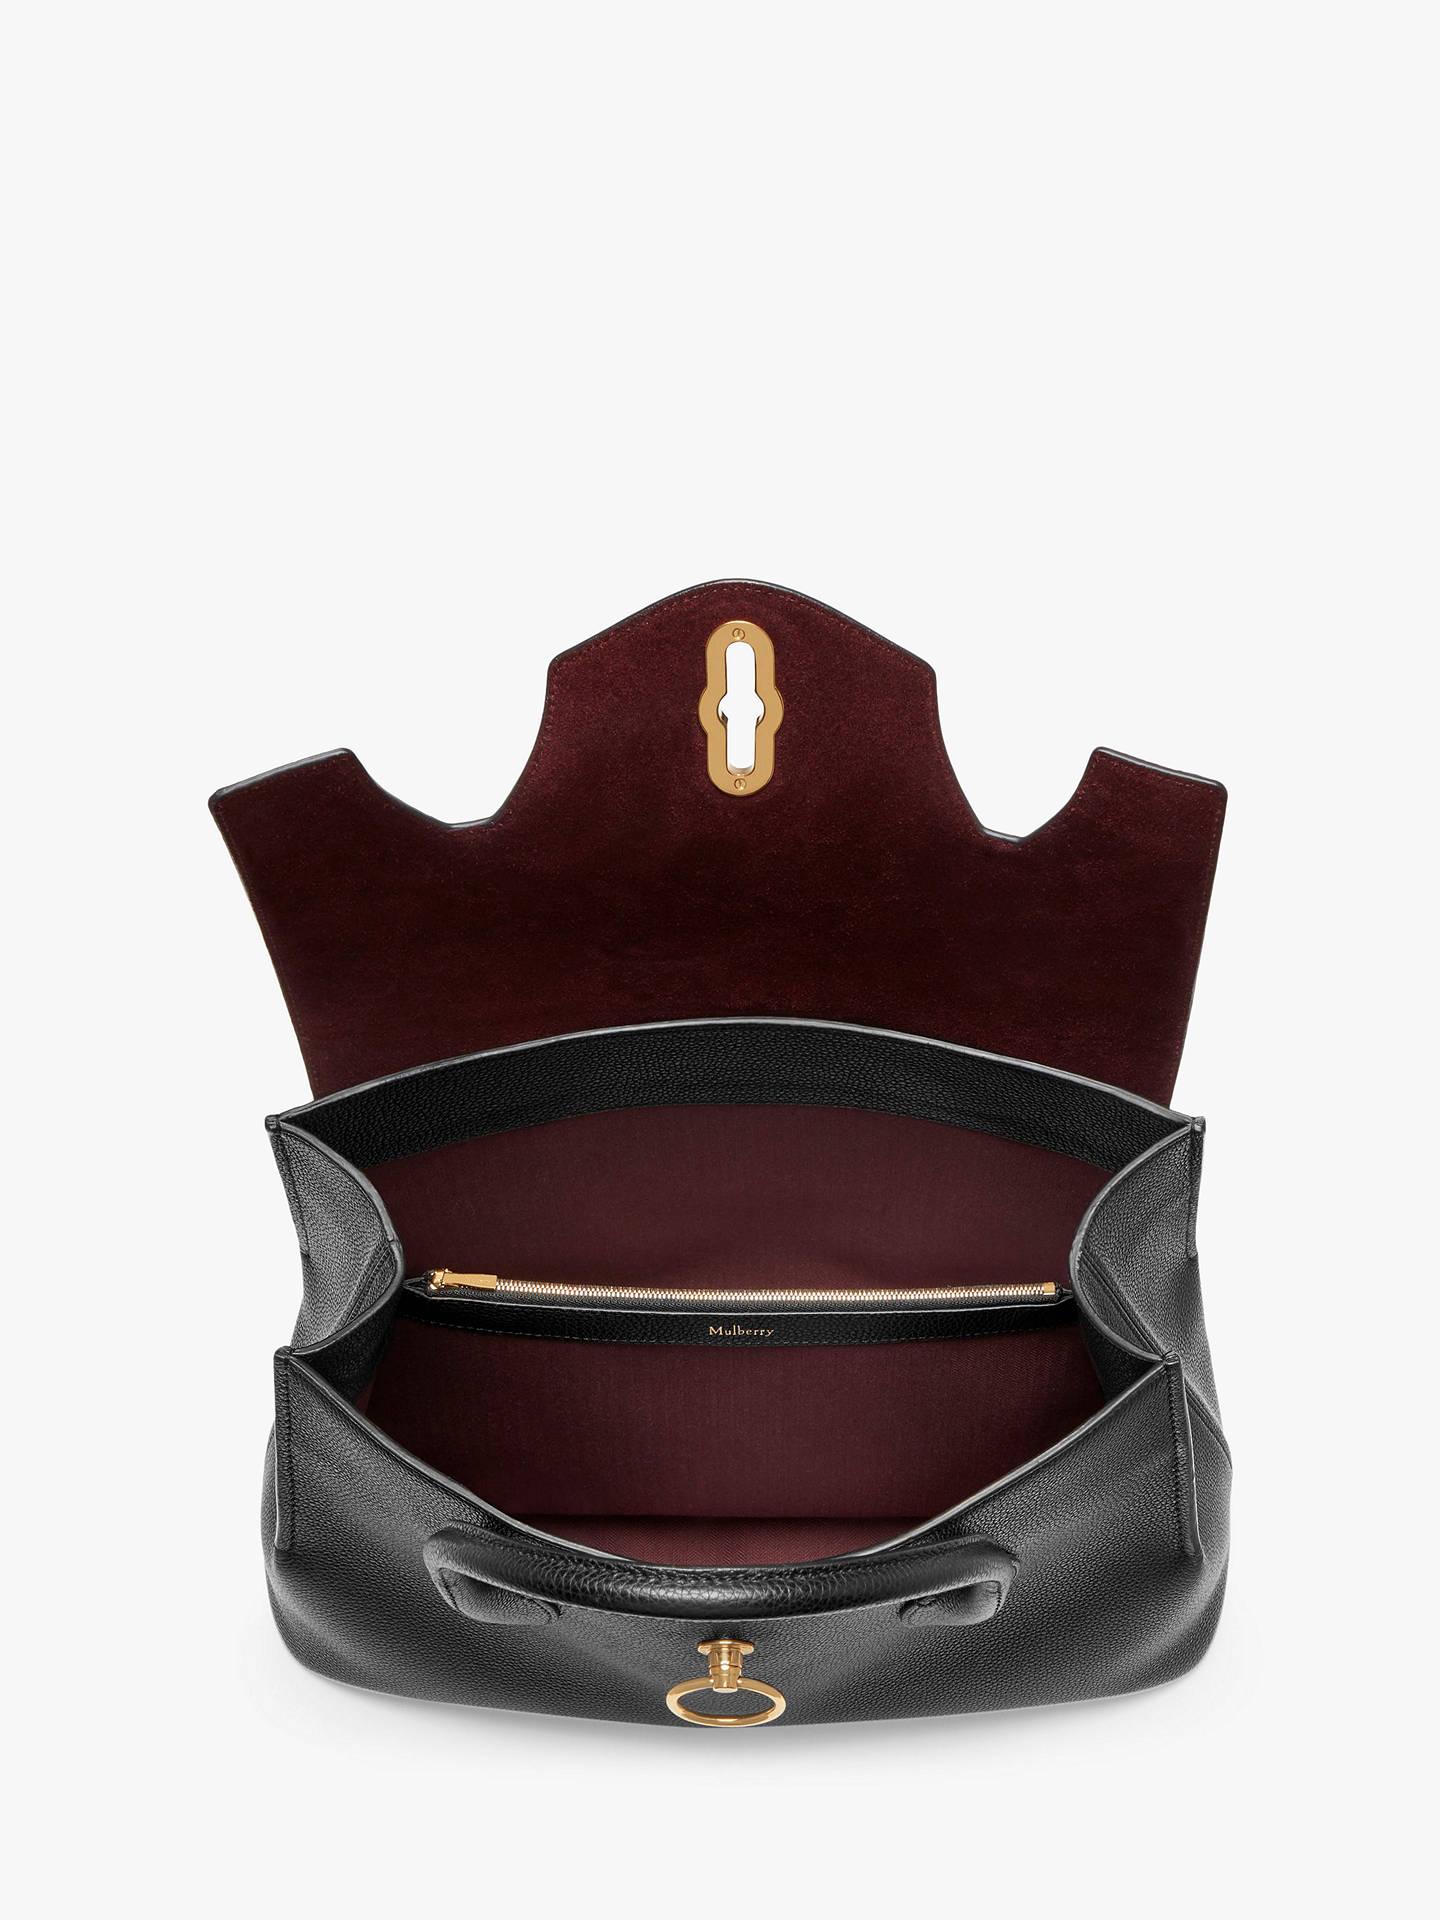 3678a760b025 Mulberry Seaton Classic Grain Leather Handbag at John Lewis   Partners